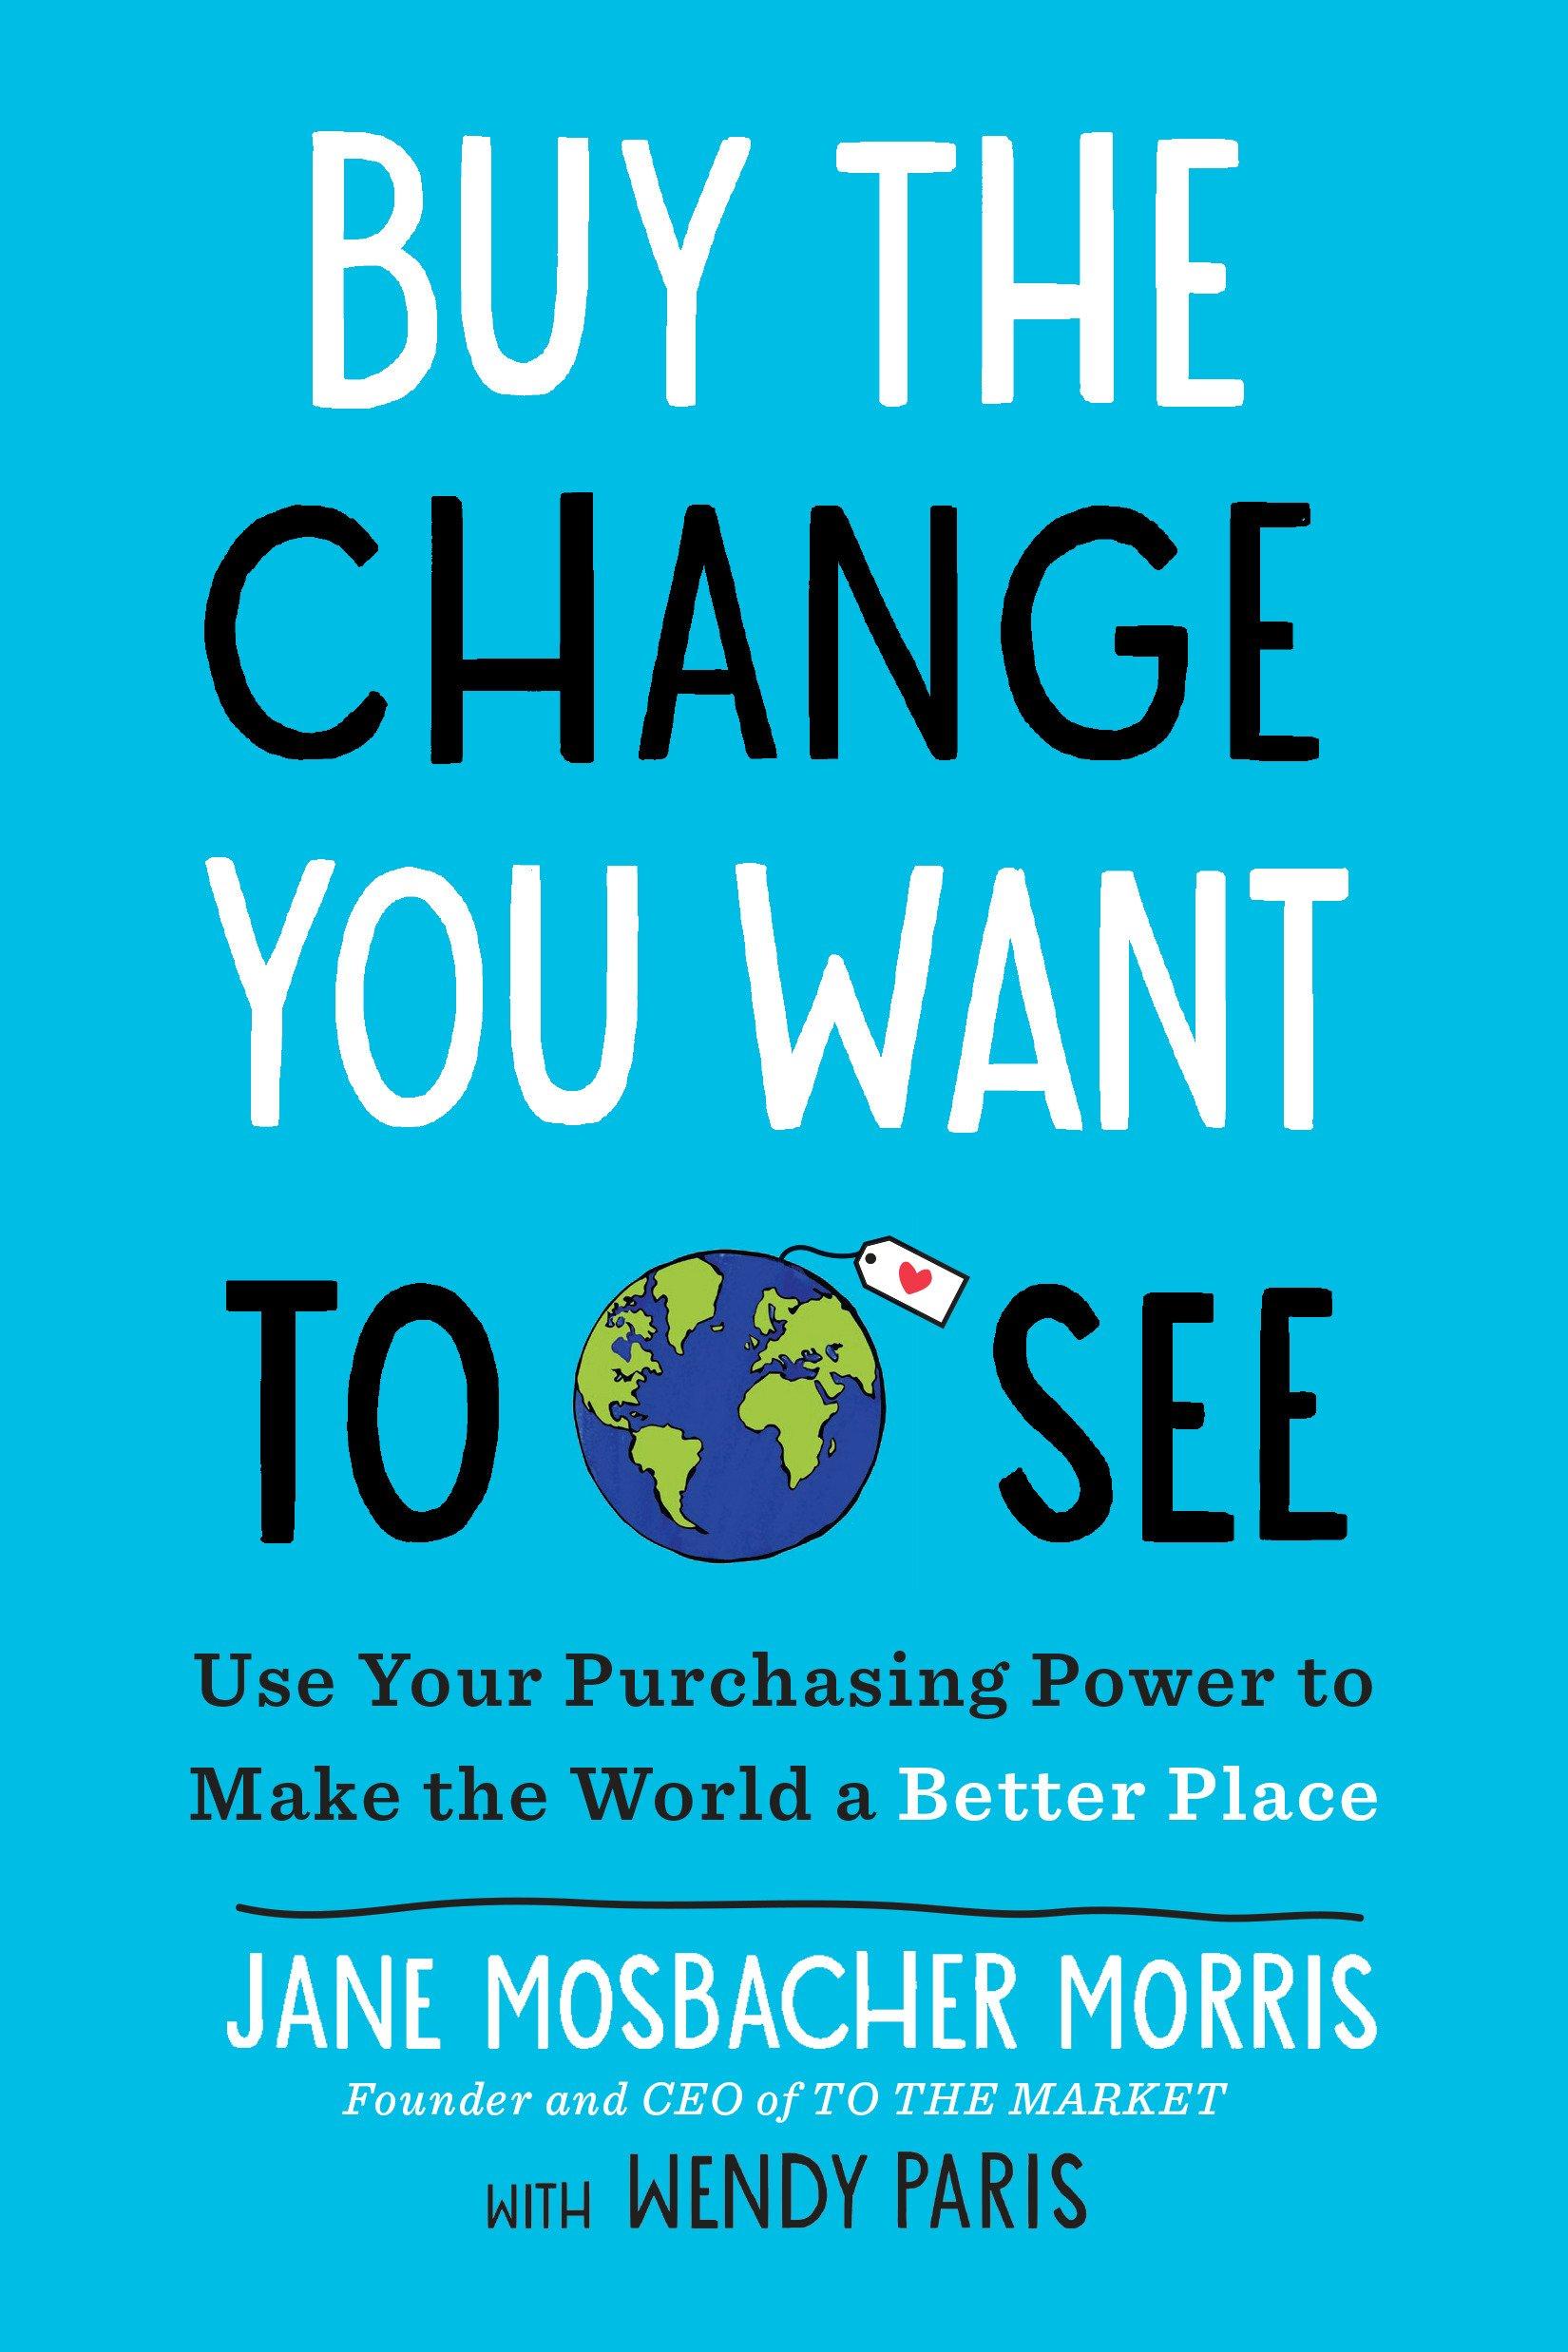 Buy the Change cover.jpg